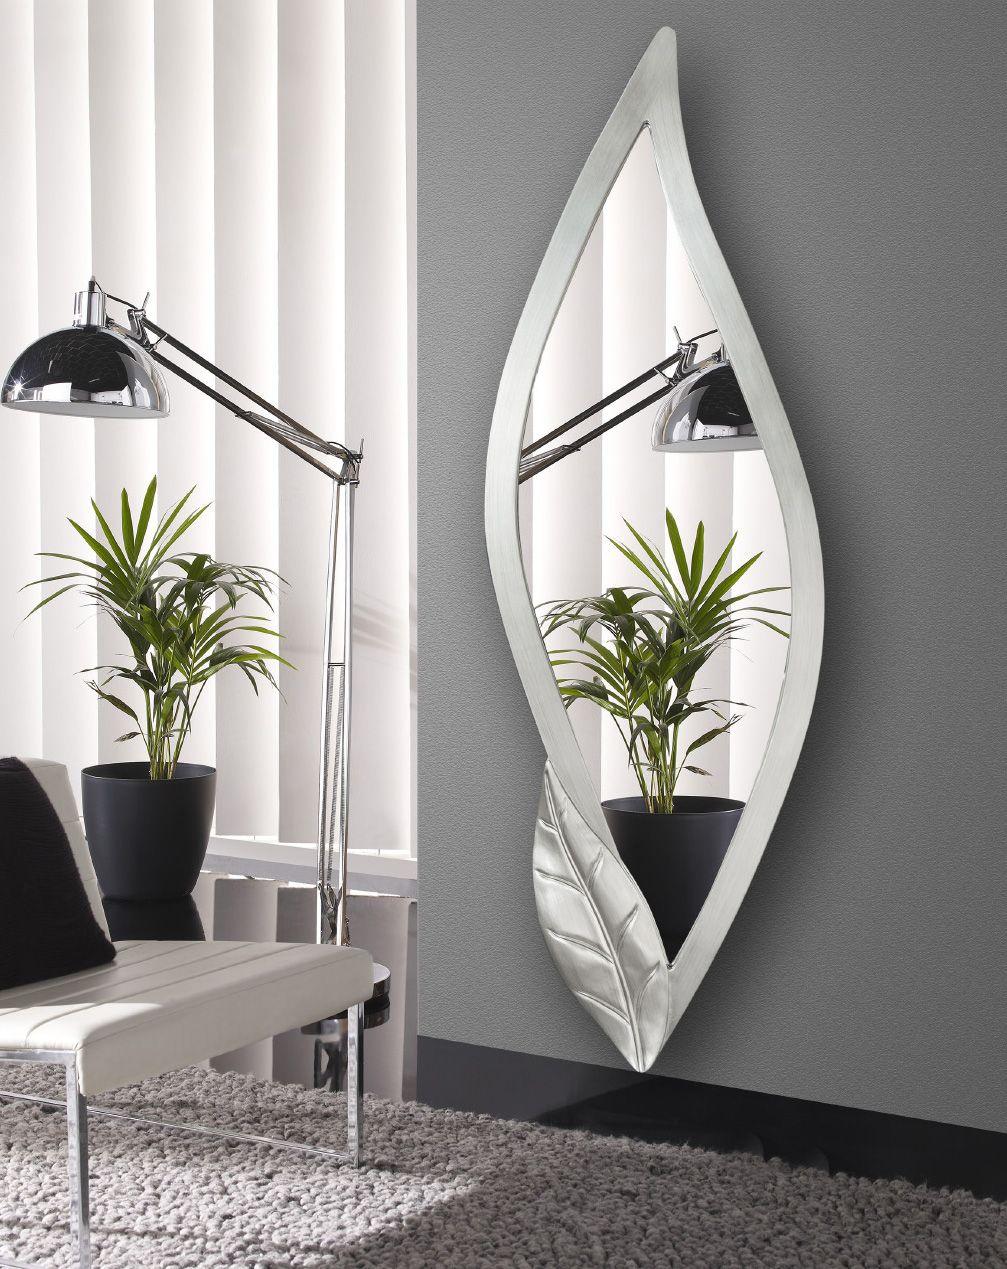 espejo vestidor pared espejo vestidor decorado espejo en pan de plata espejo en